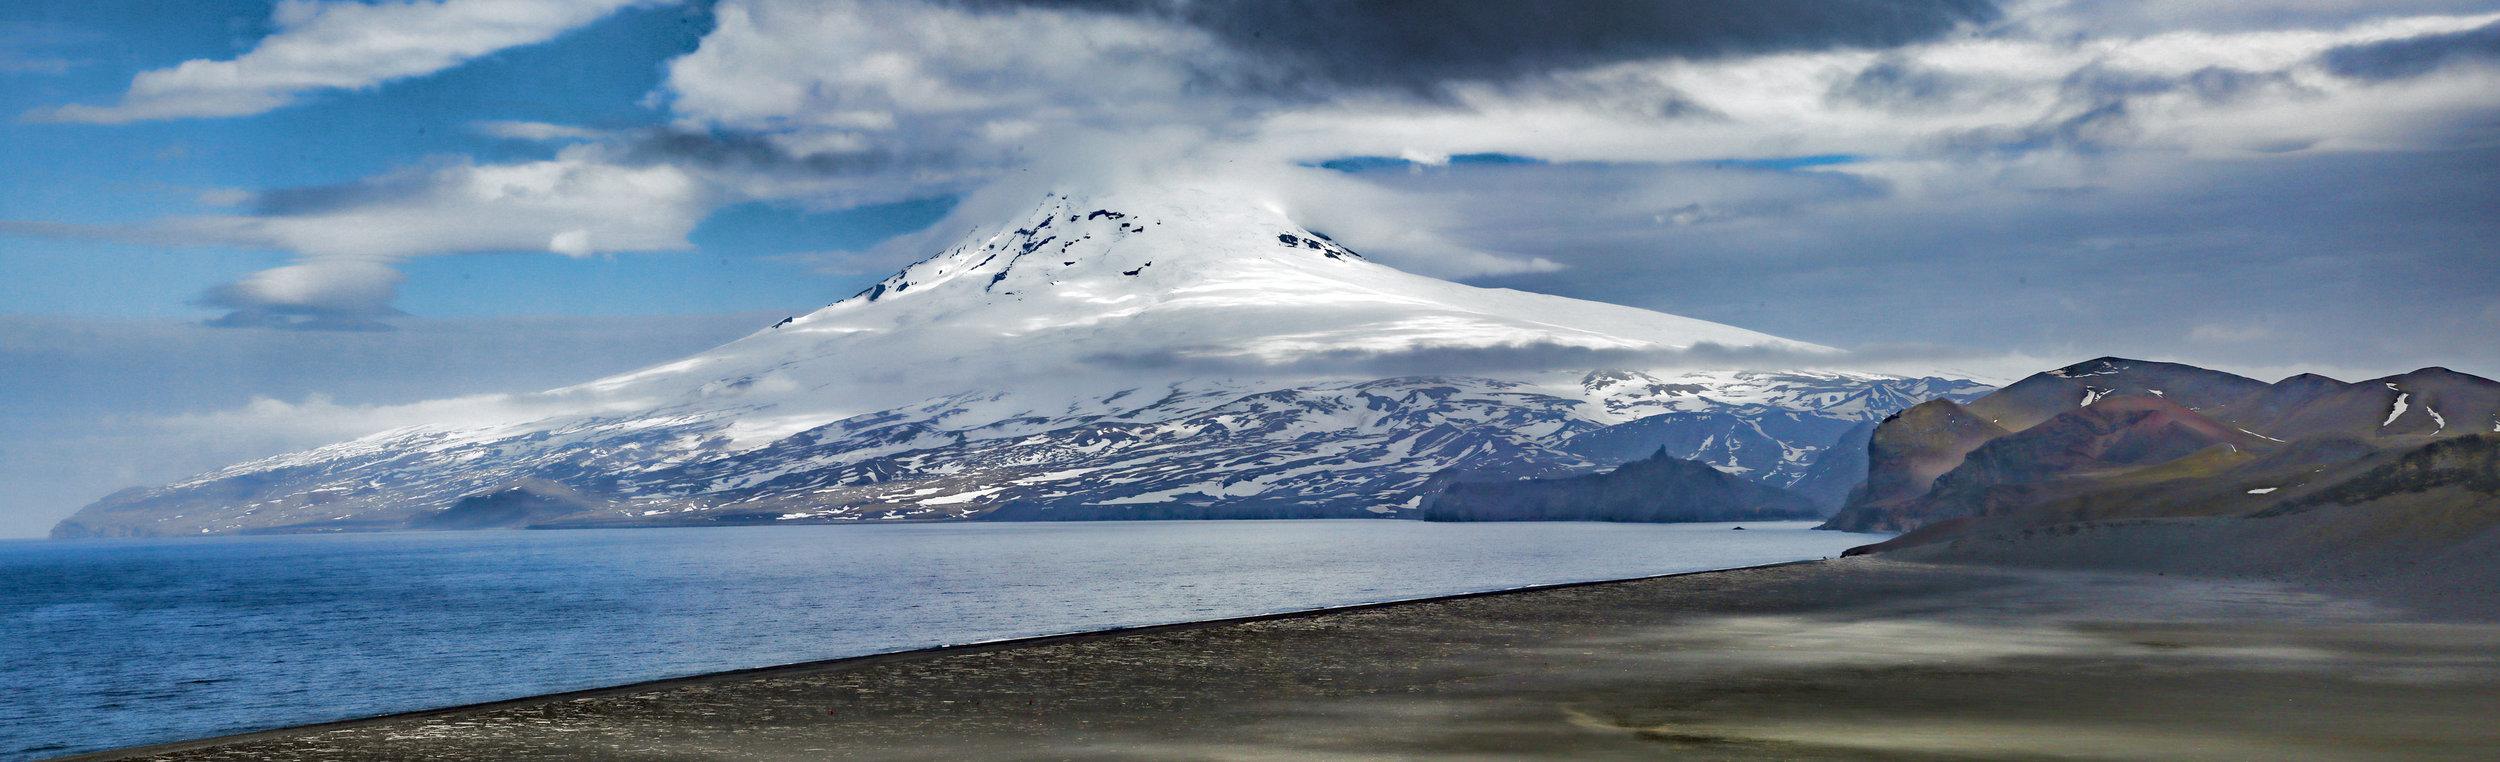 Beerenberg volcano, rising to 2,277 m (7,470 feet) above sea level.